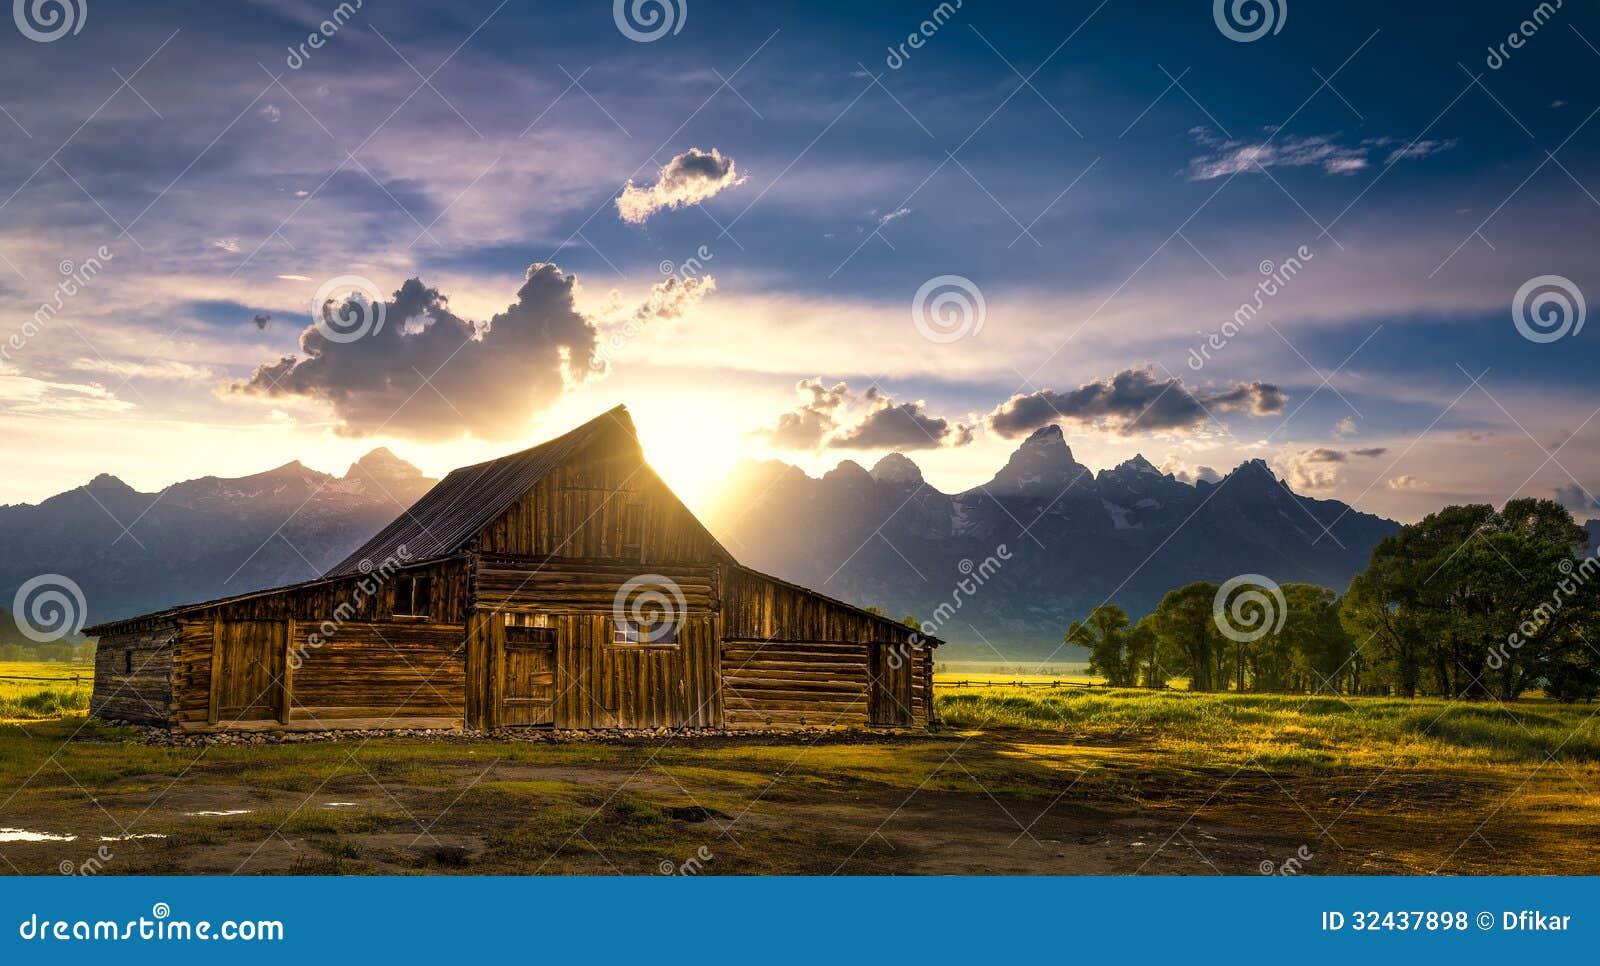 T.A. Moulton Barn After a tempestade